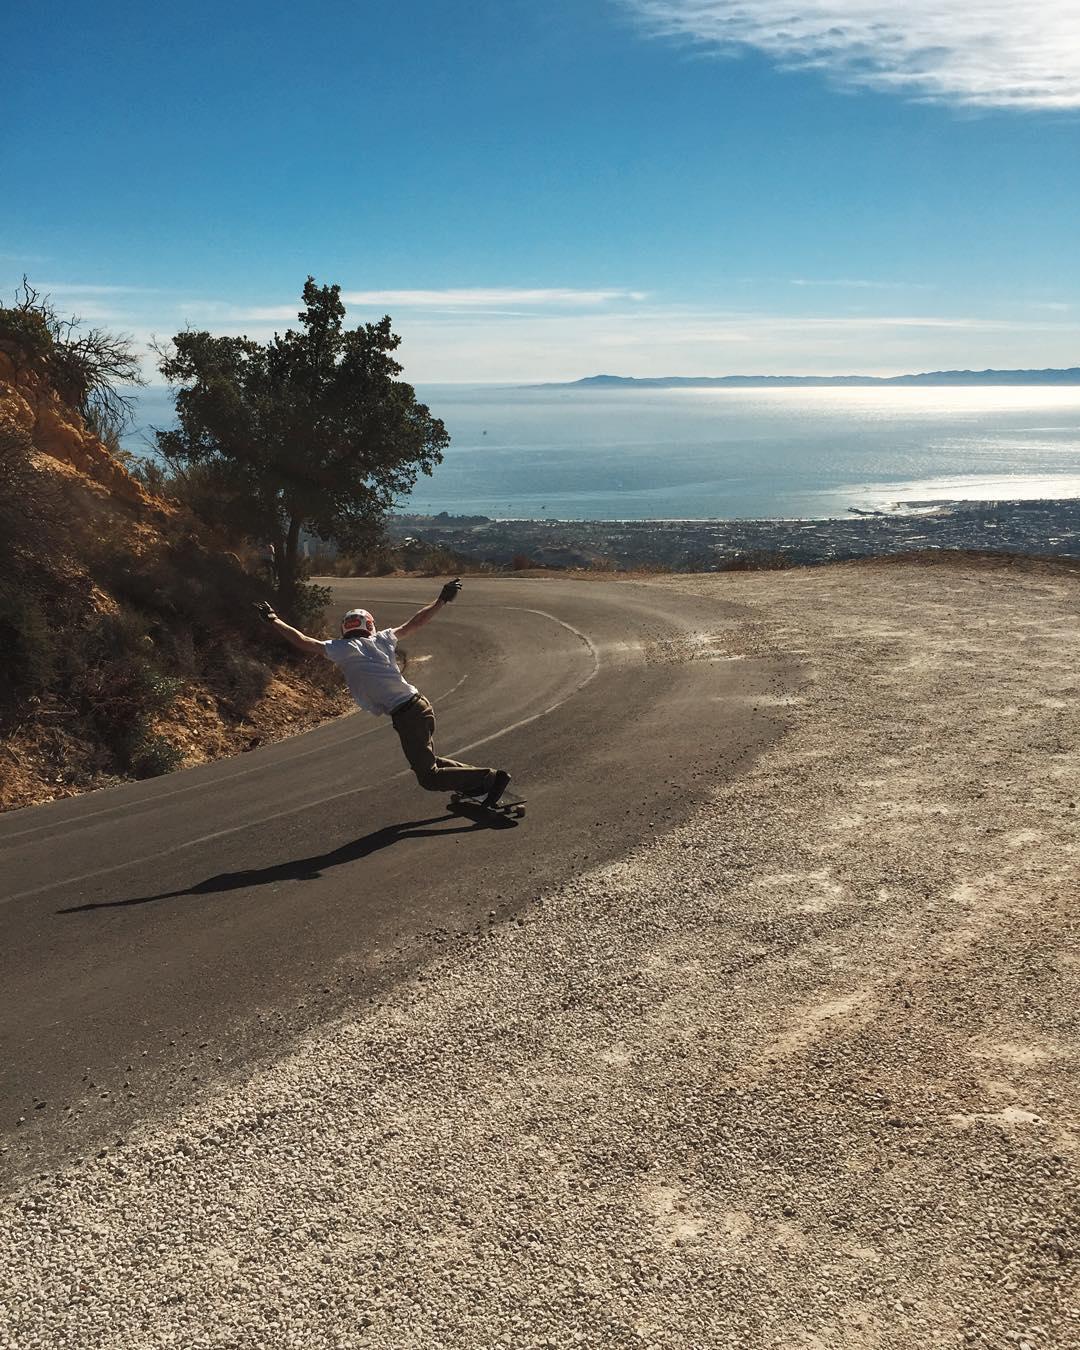 @davebfromsb with a clean backside over Santa Barbara. #caliberprecision photo - @liam_lbdr_